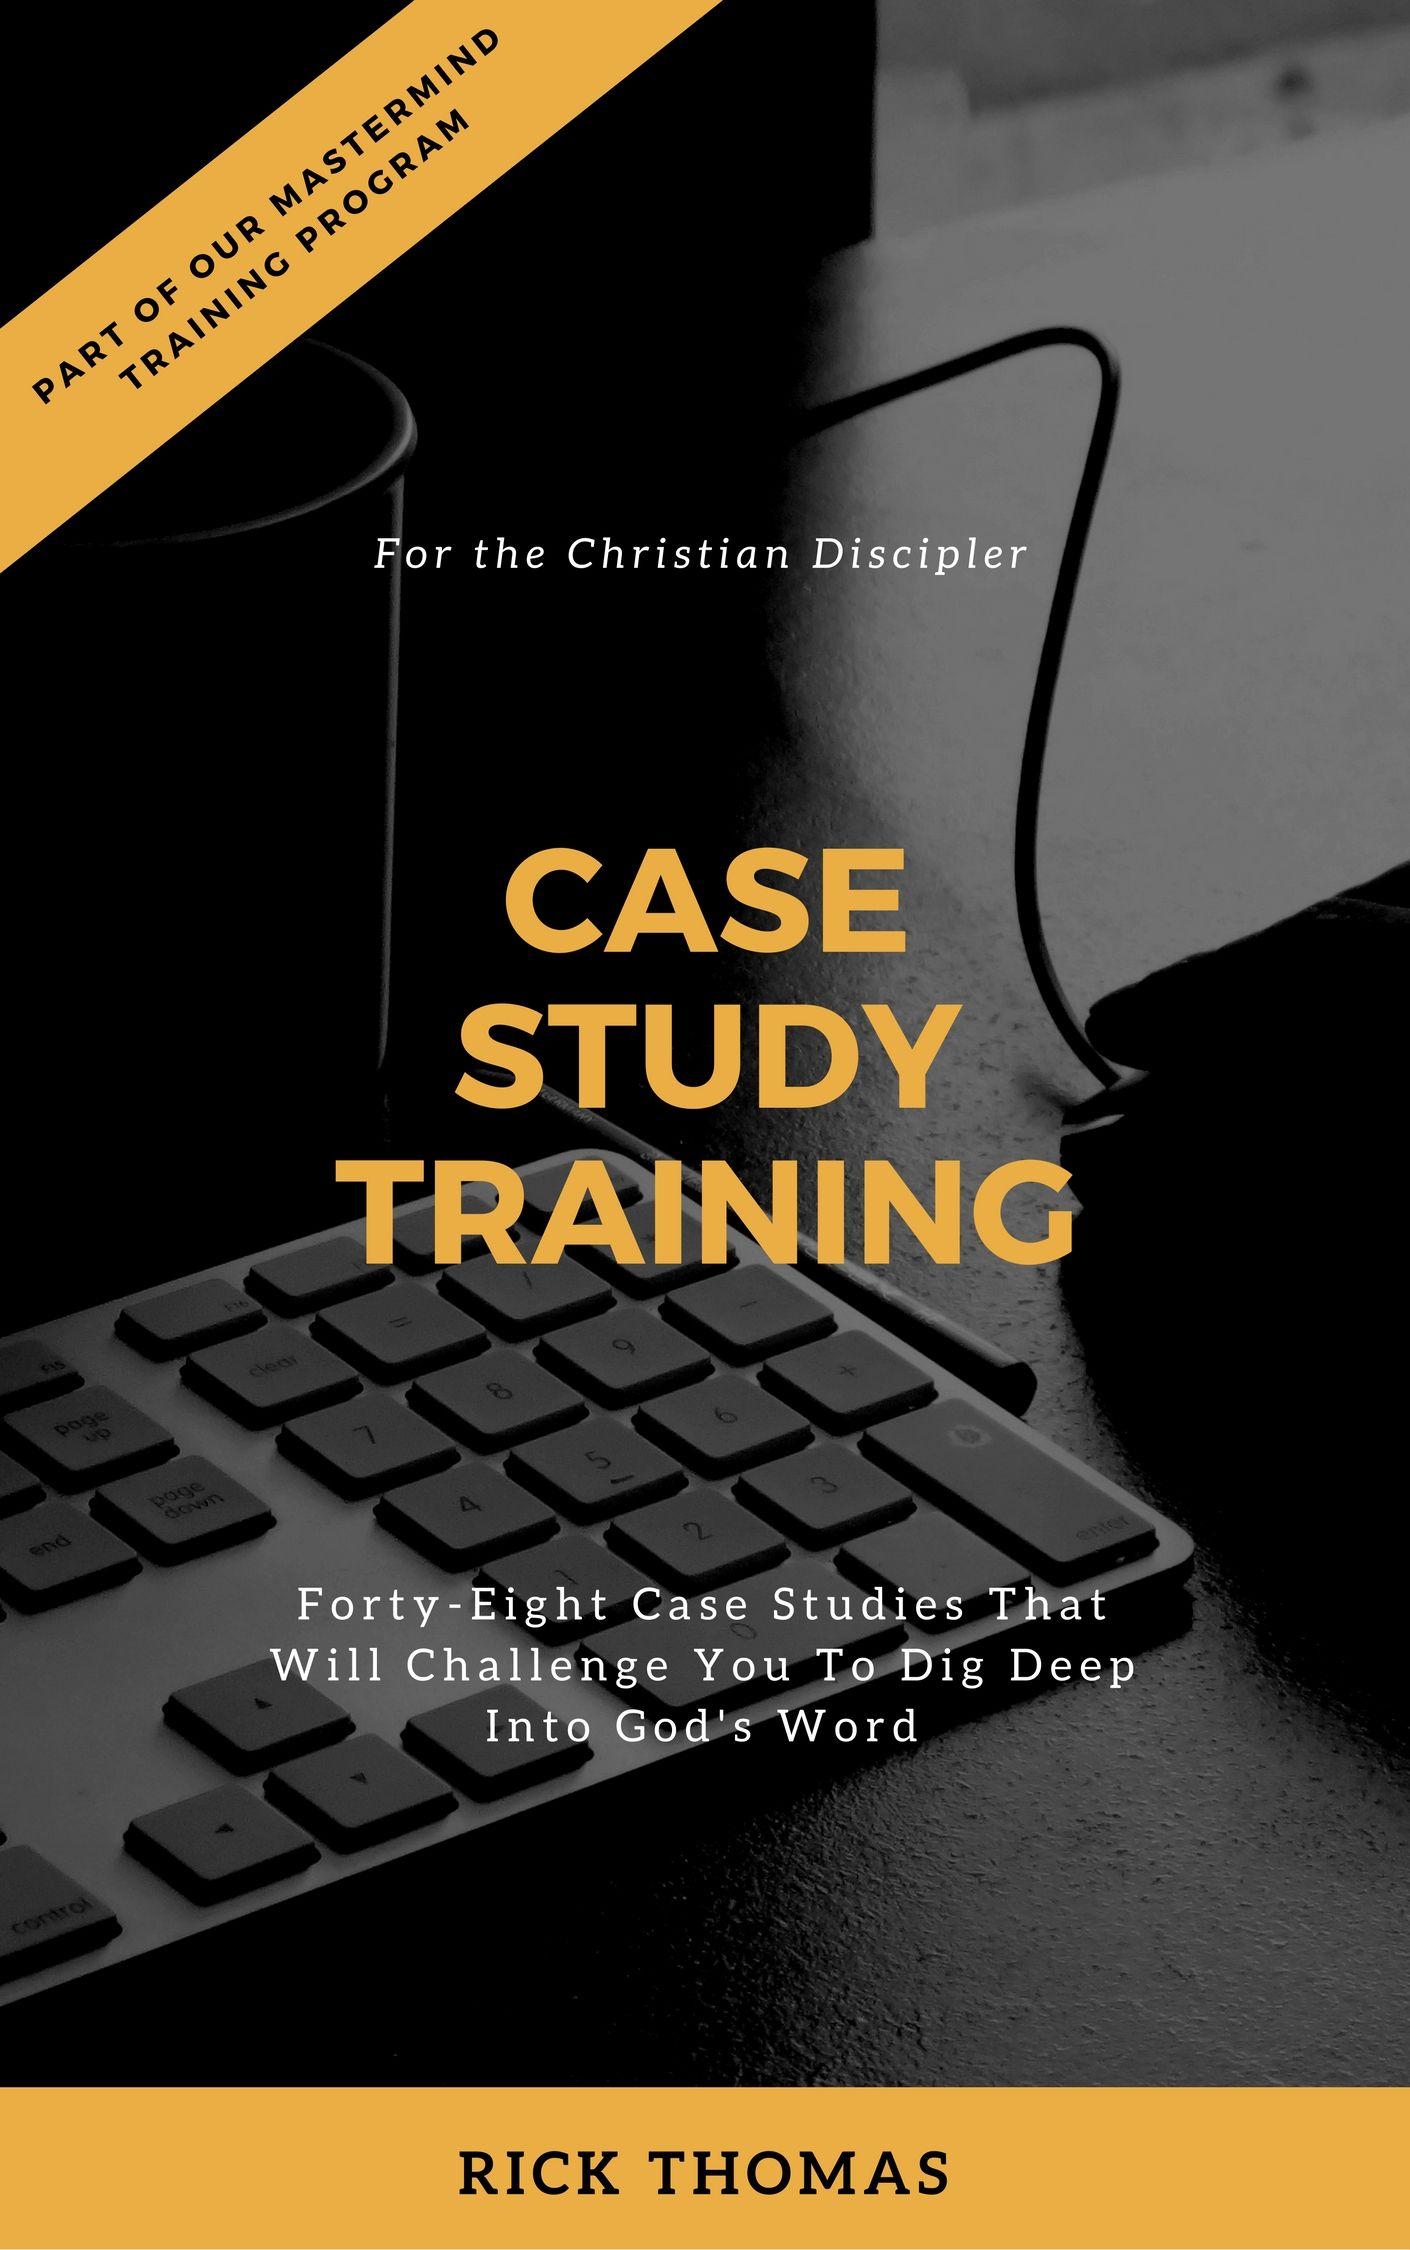 Case Study Training Case study, Words, Dig deep